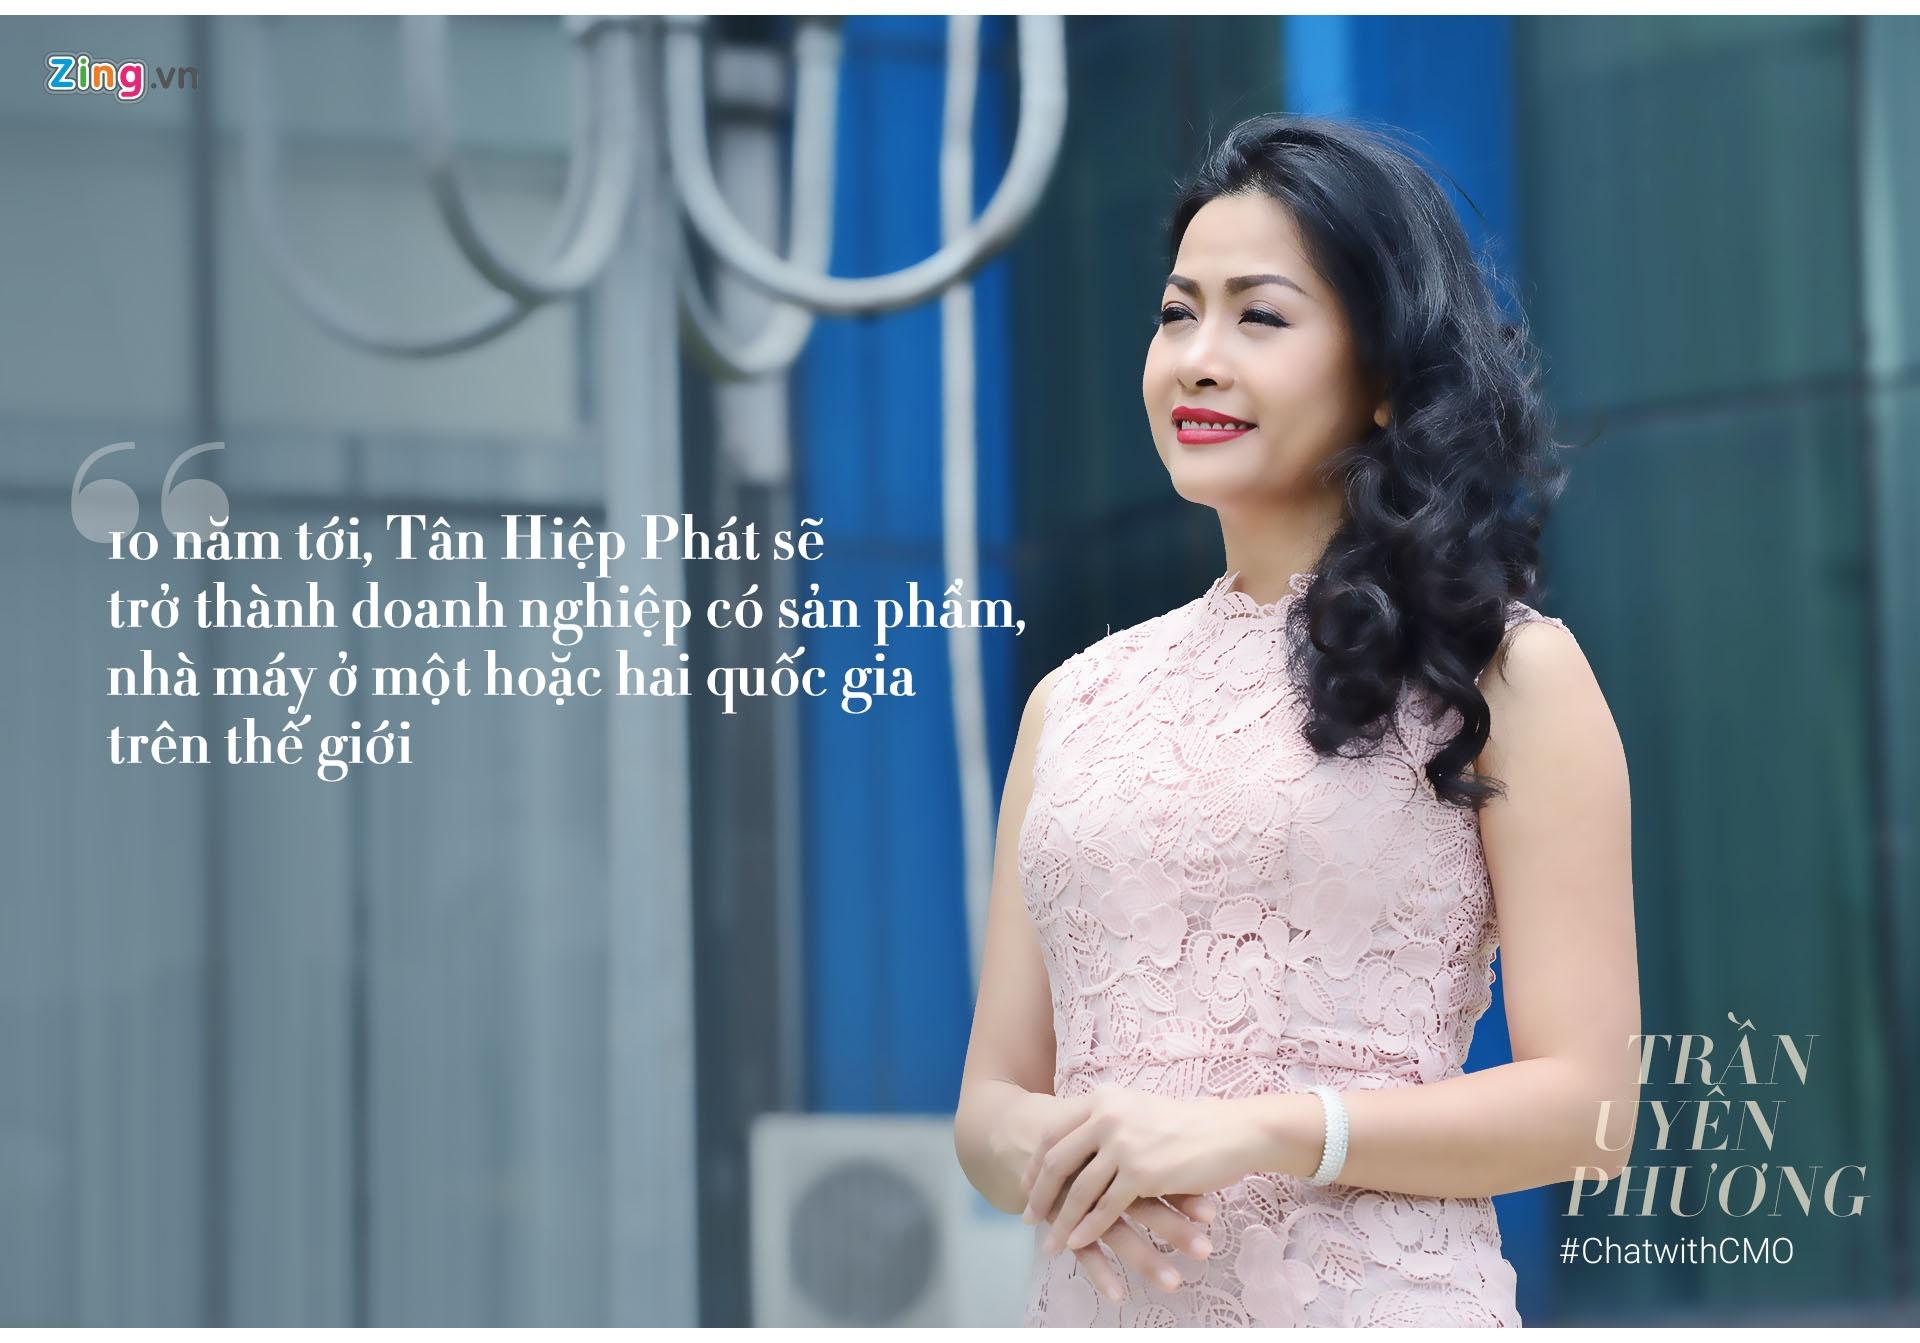 Tran Uyen Phuong Tan Hiep Phat anh 16